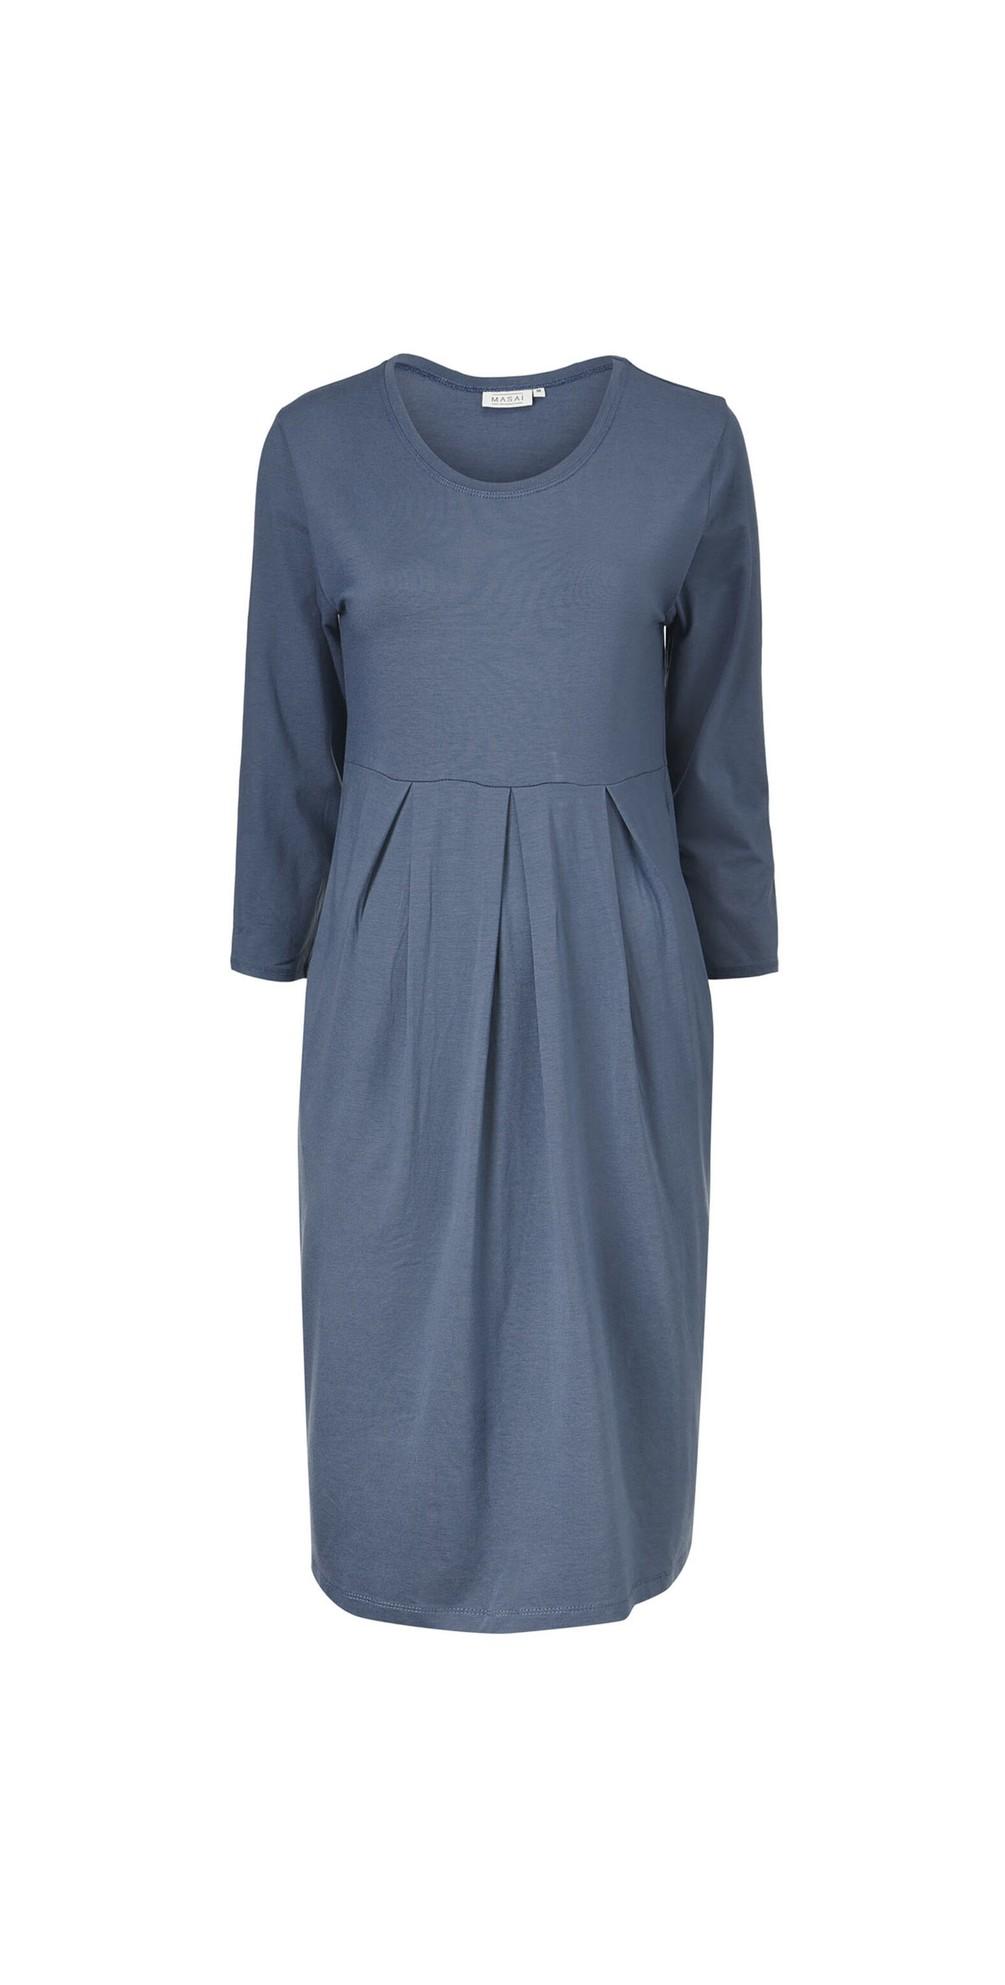 Noma Plain Dress main image